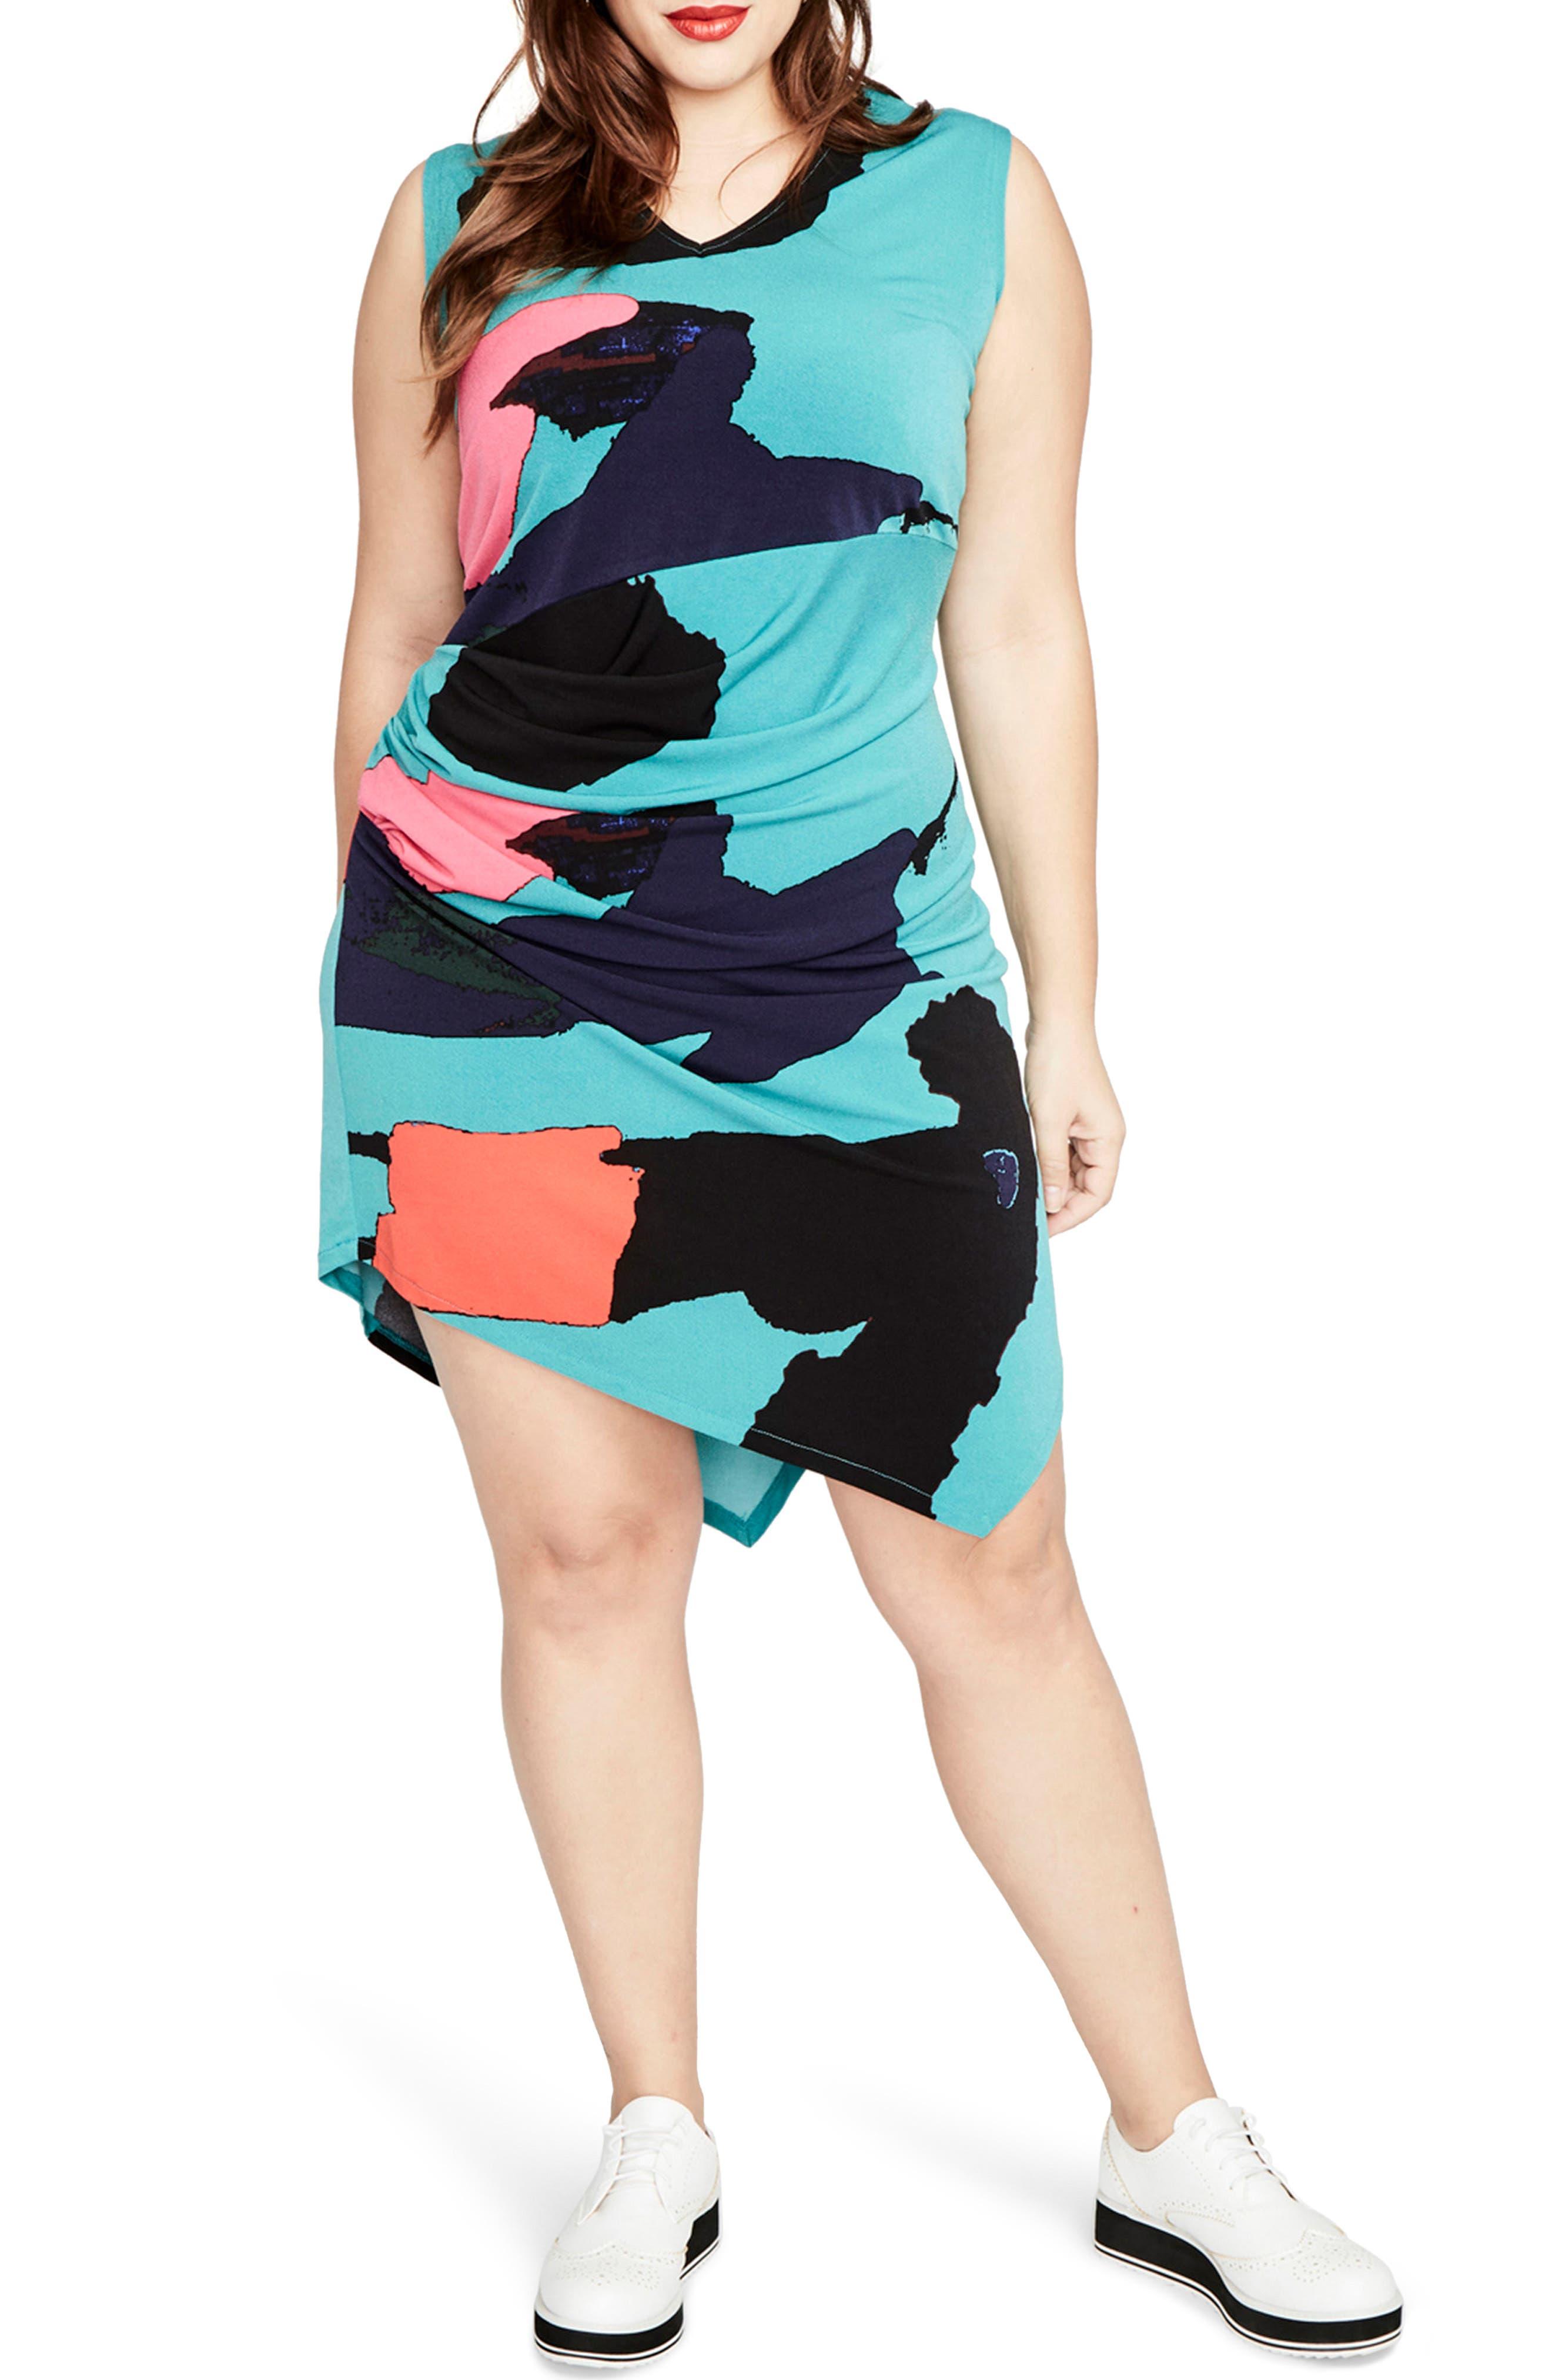 RACHEL BY Rachel Roy Abstract Print Asymmetrical Draped Dress,                         Main,                         color, 314